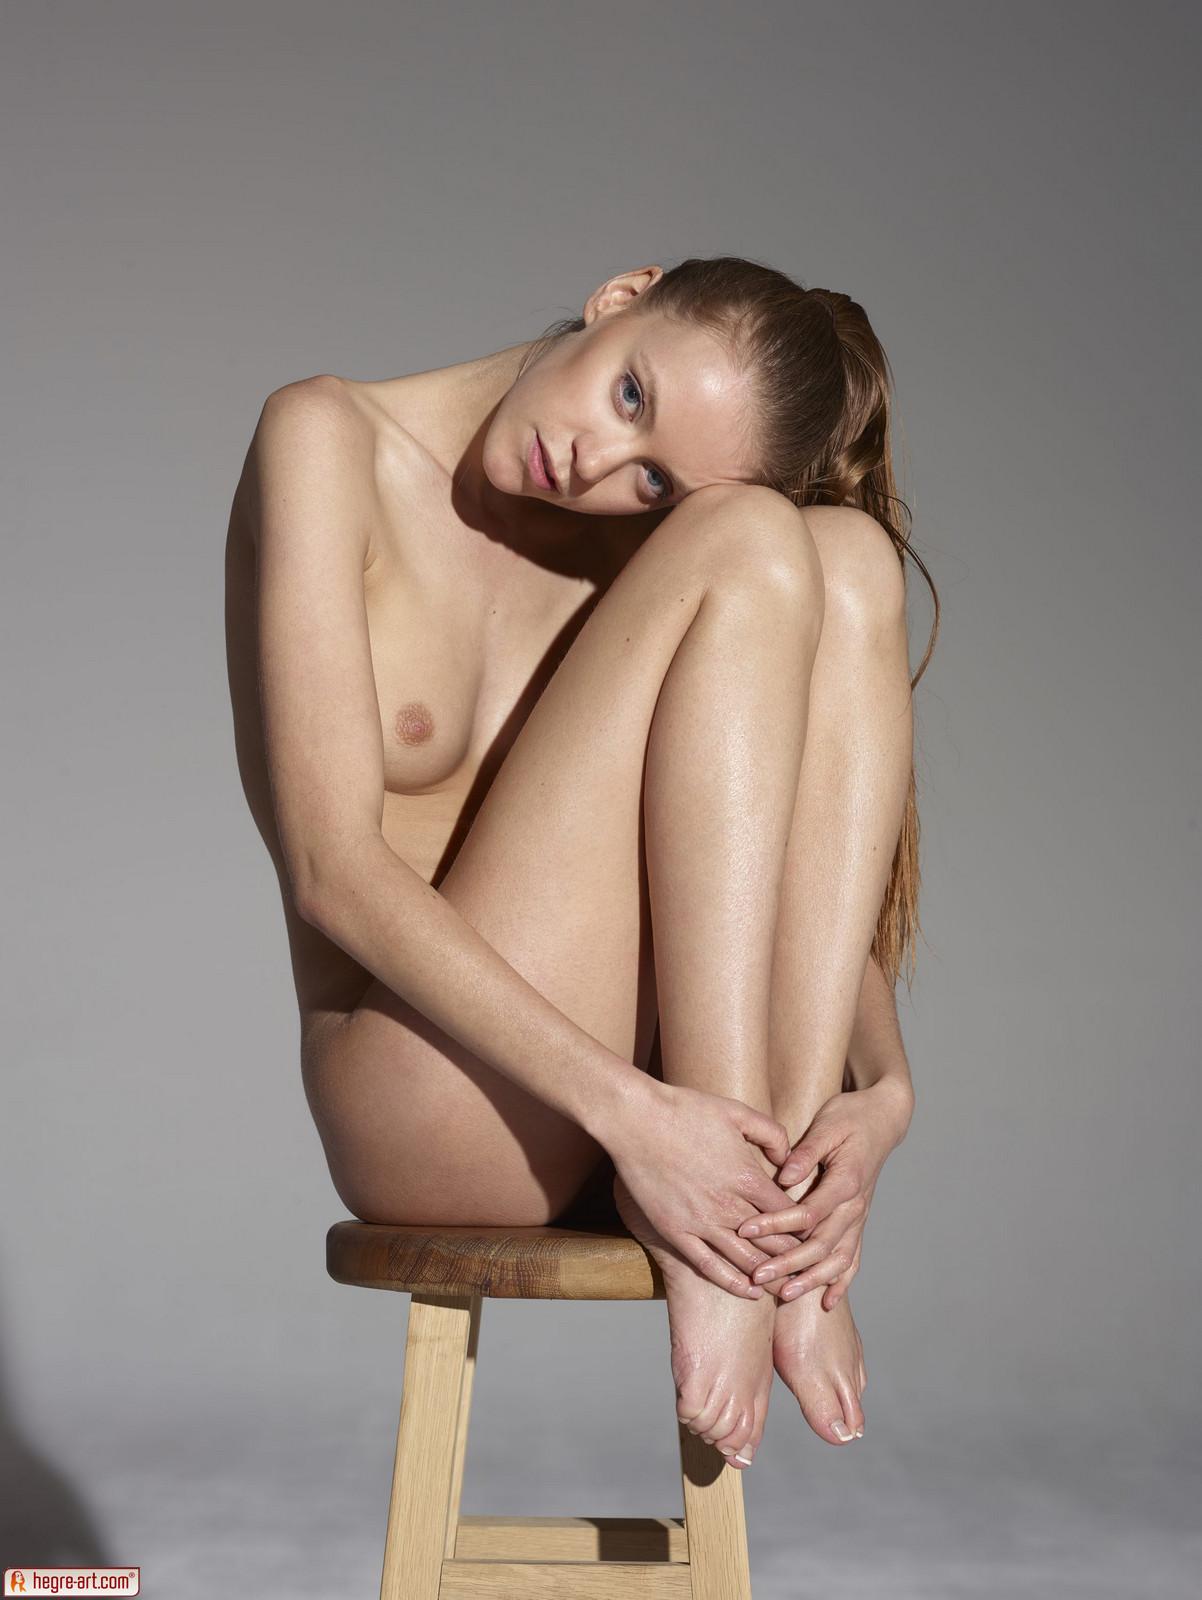 Free emma a nude art gallery